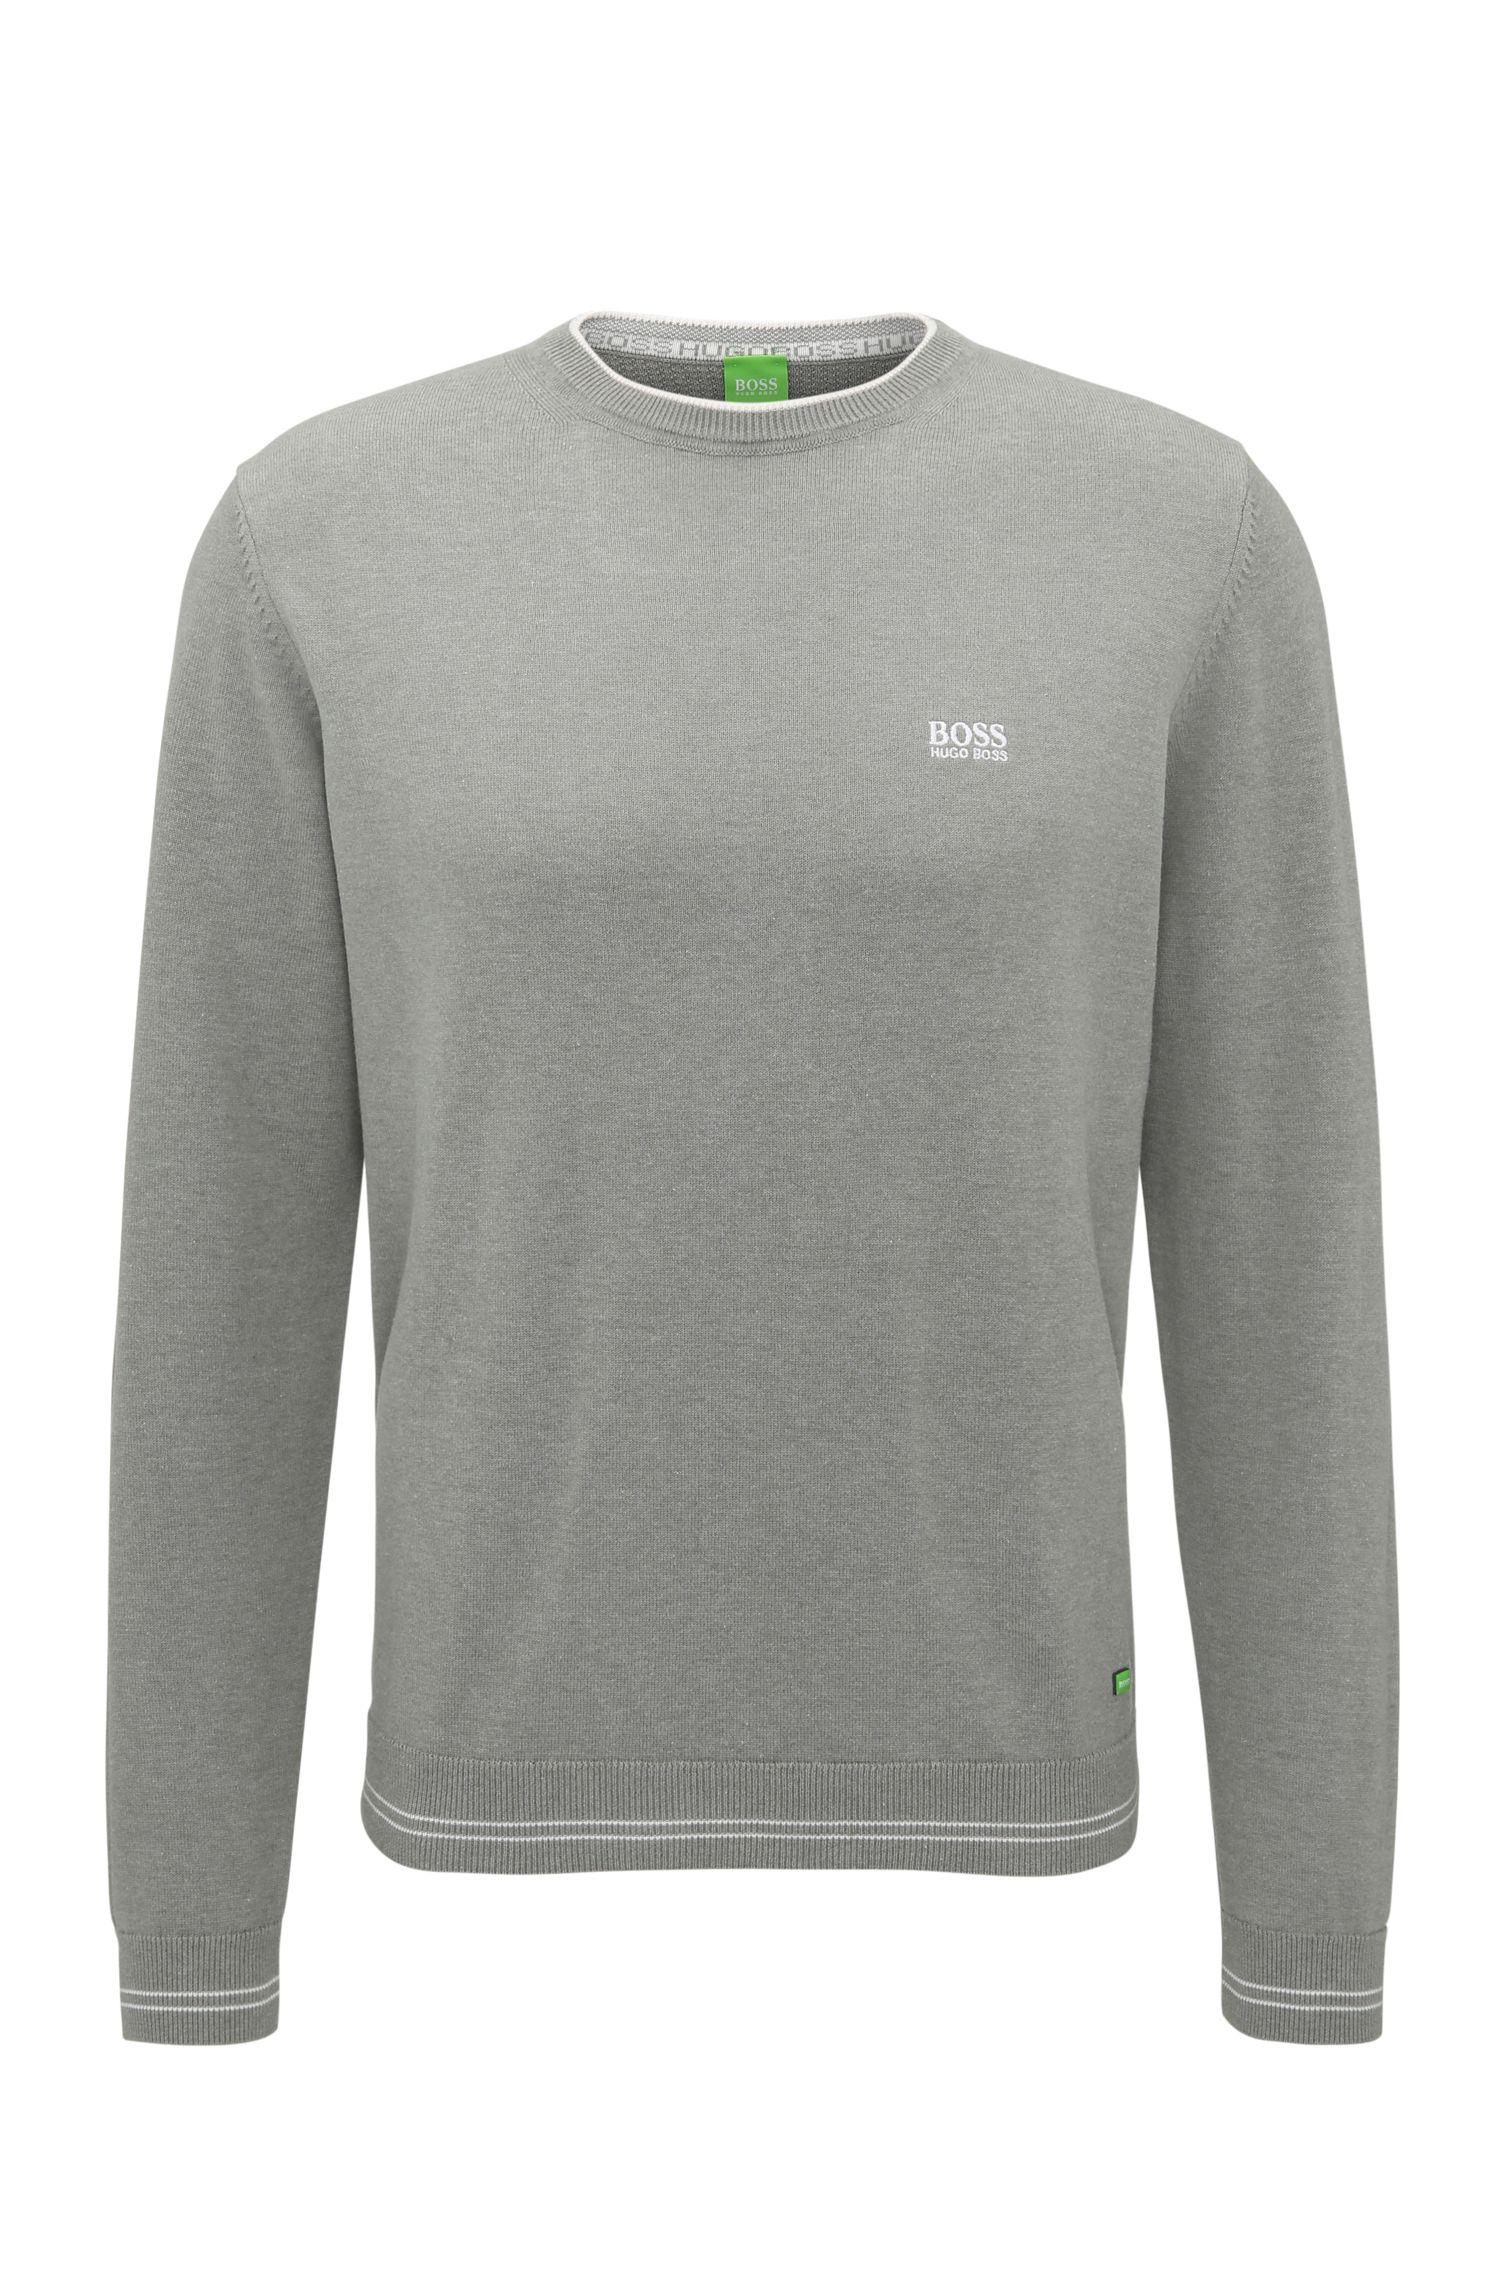 'Rime'   Regular Fit, Cotton Blend Sweater